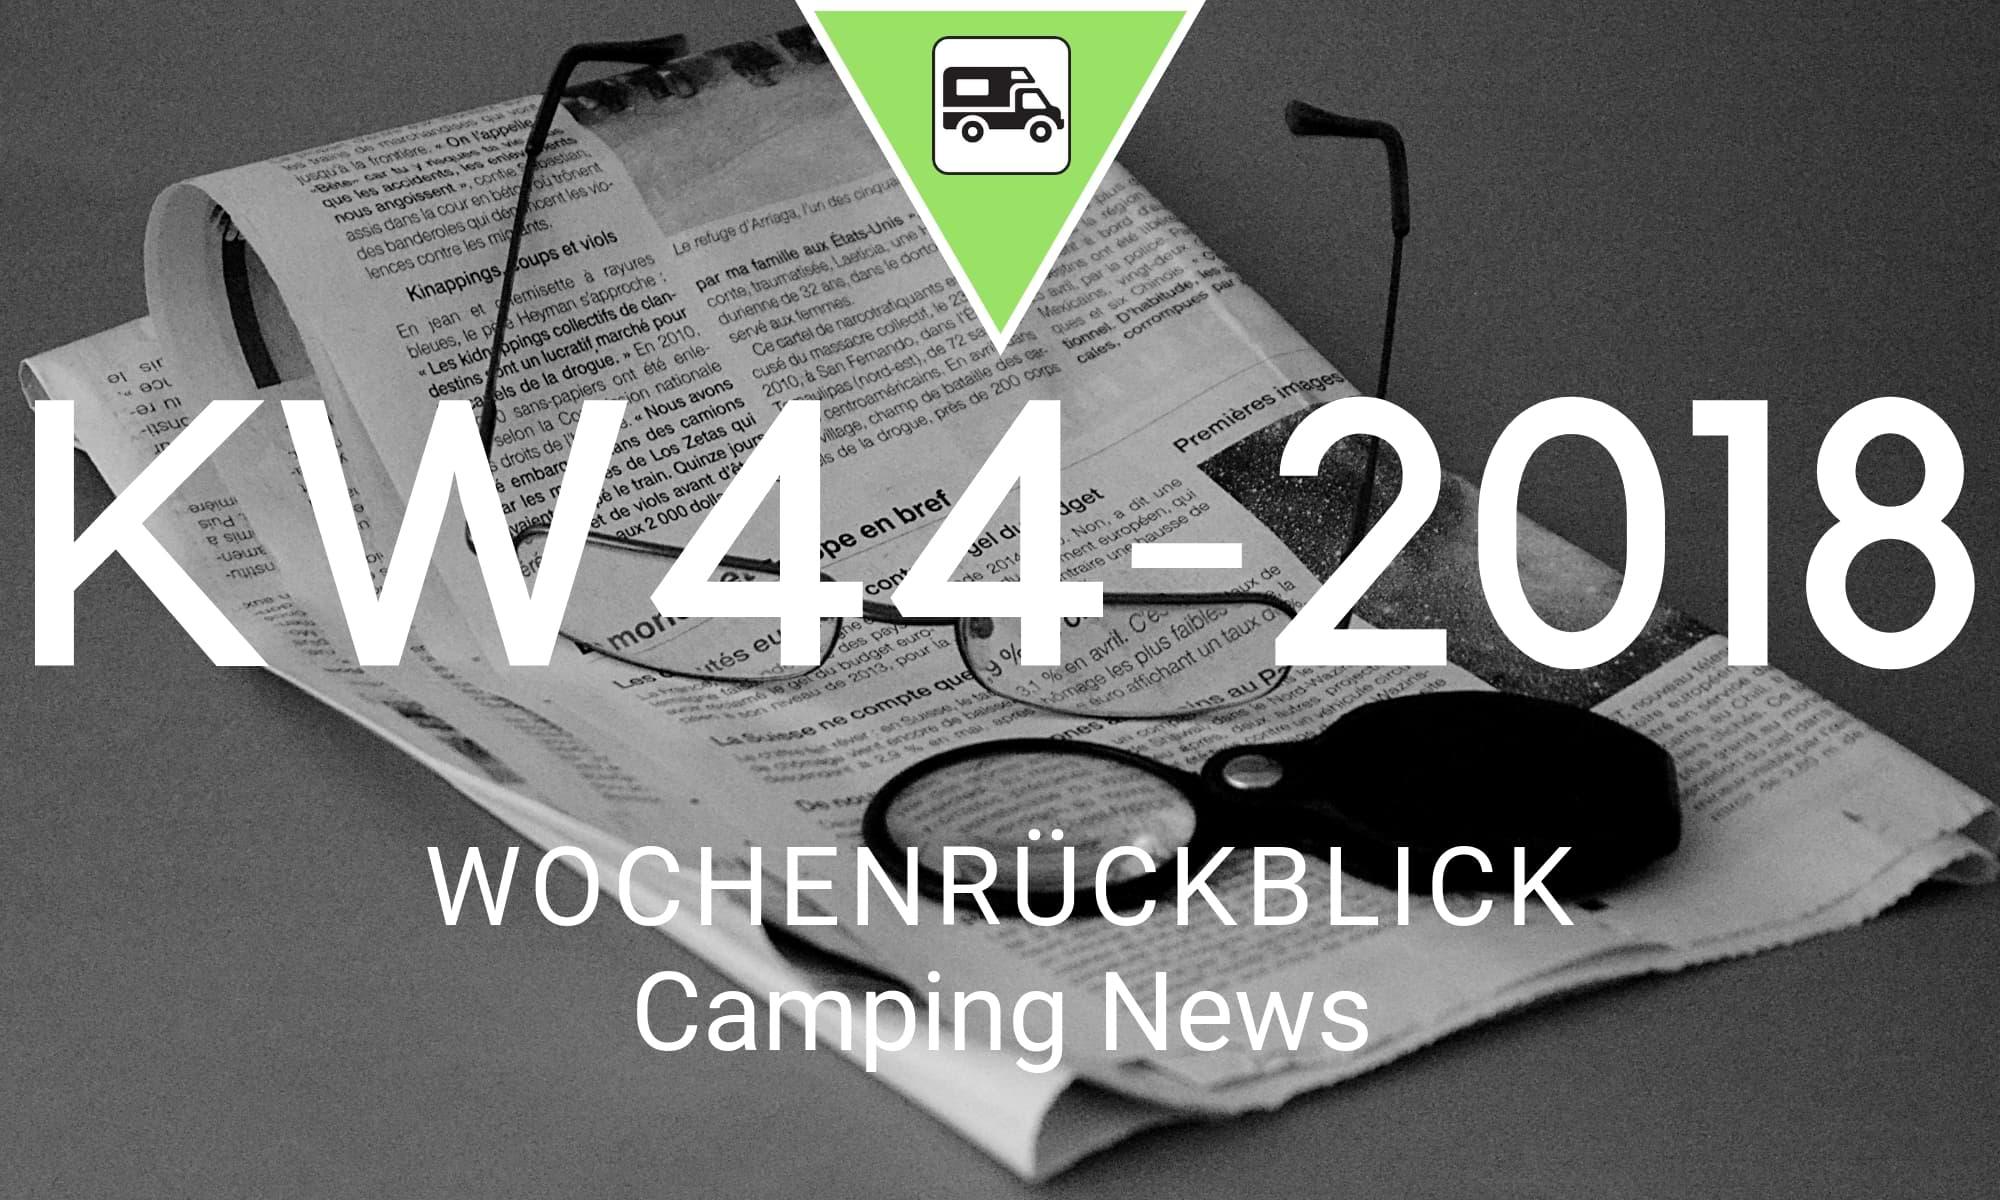 Wochenrückblick Camping News KW44-2018